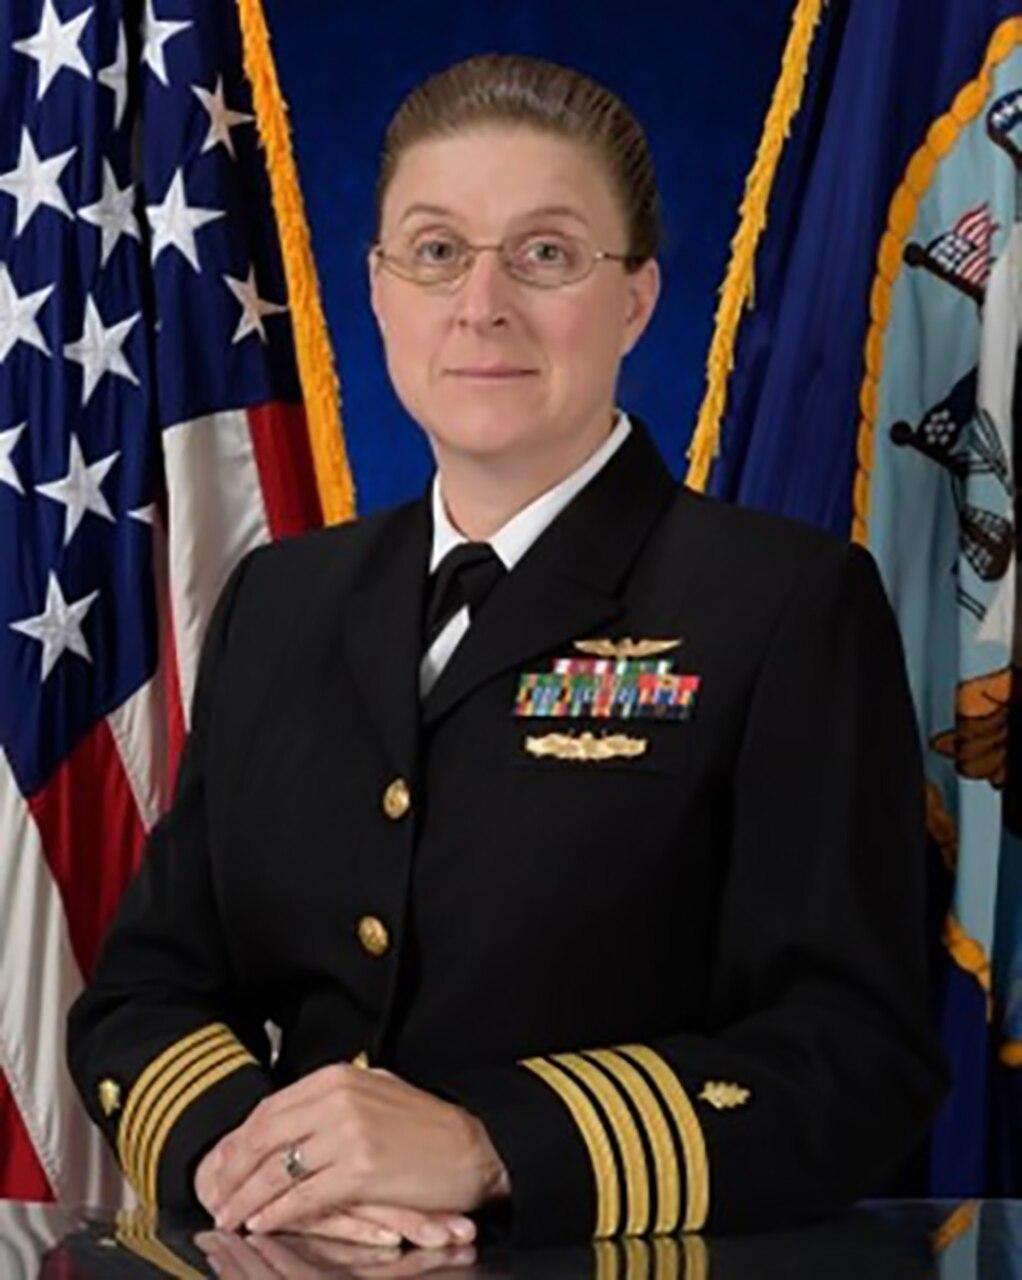 Capt. Kathryn Elliott